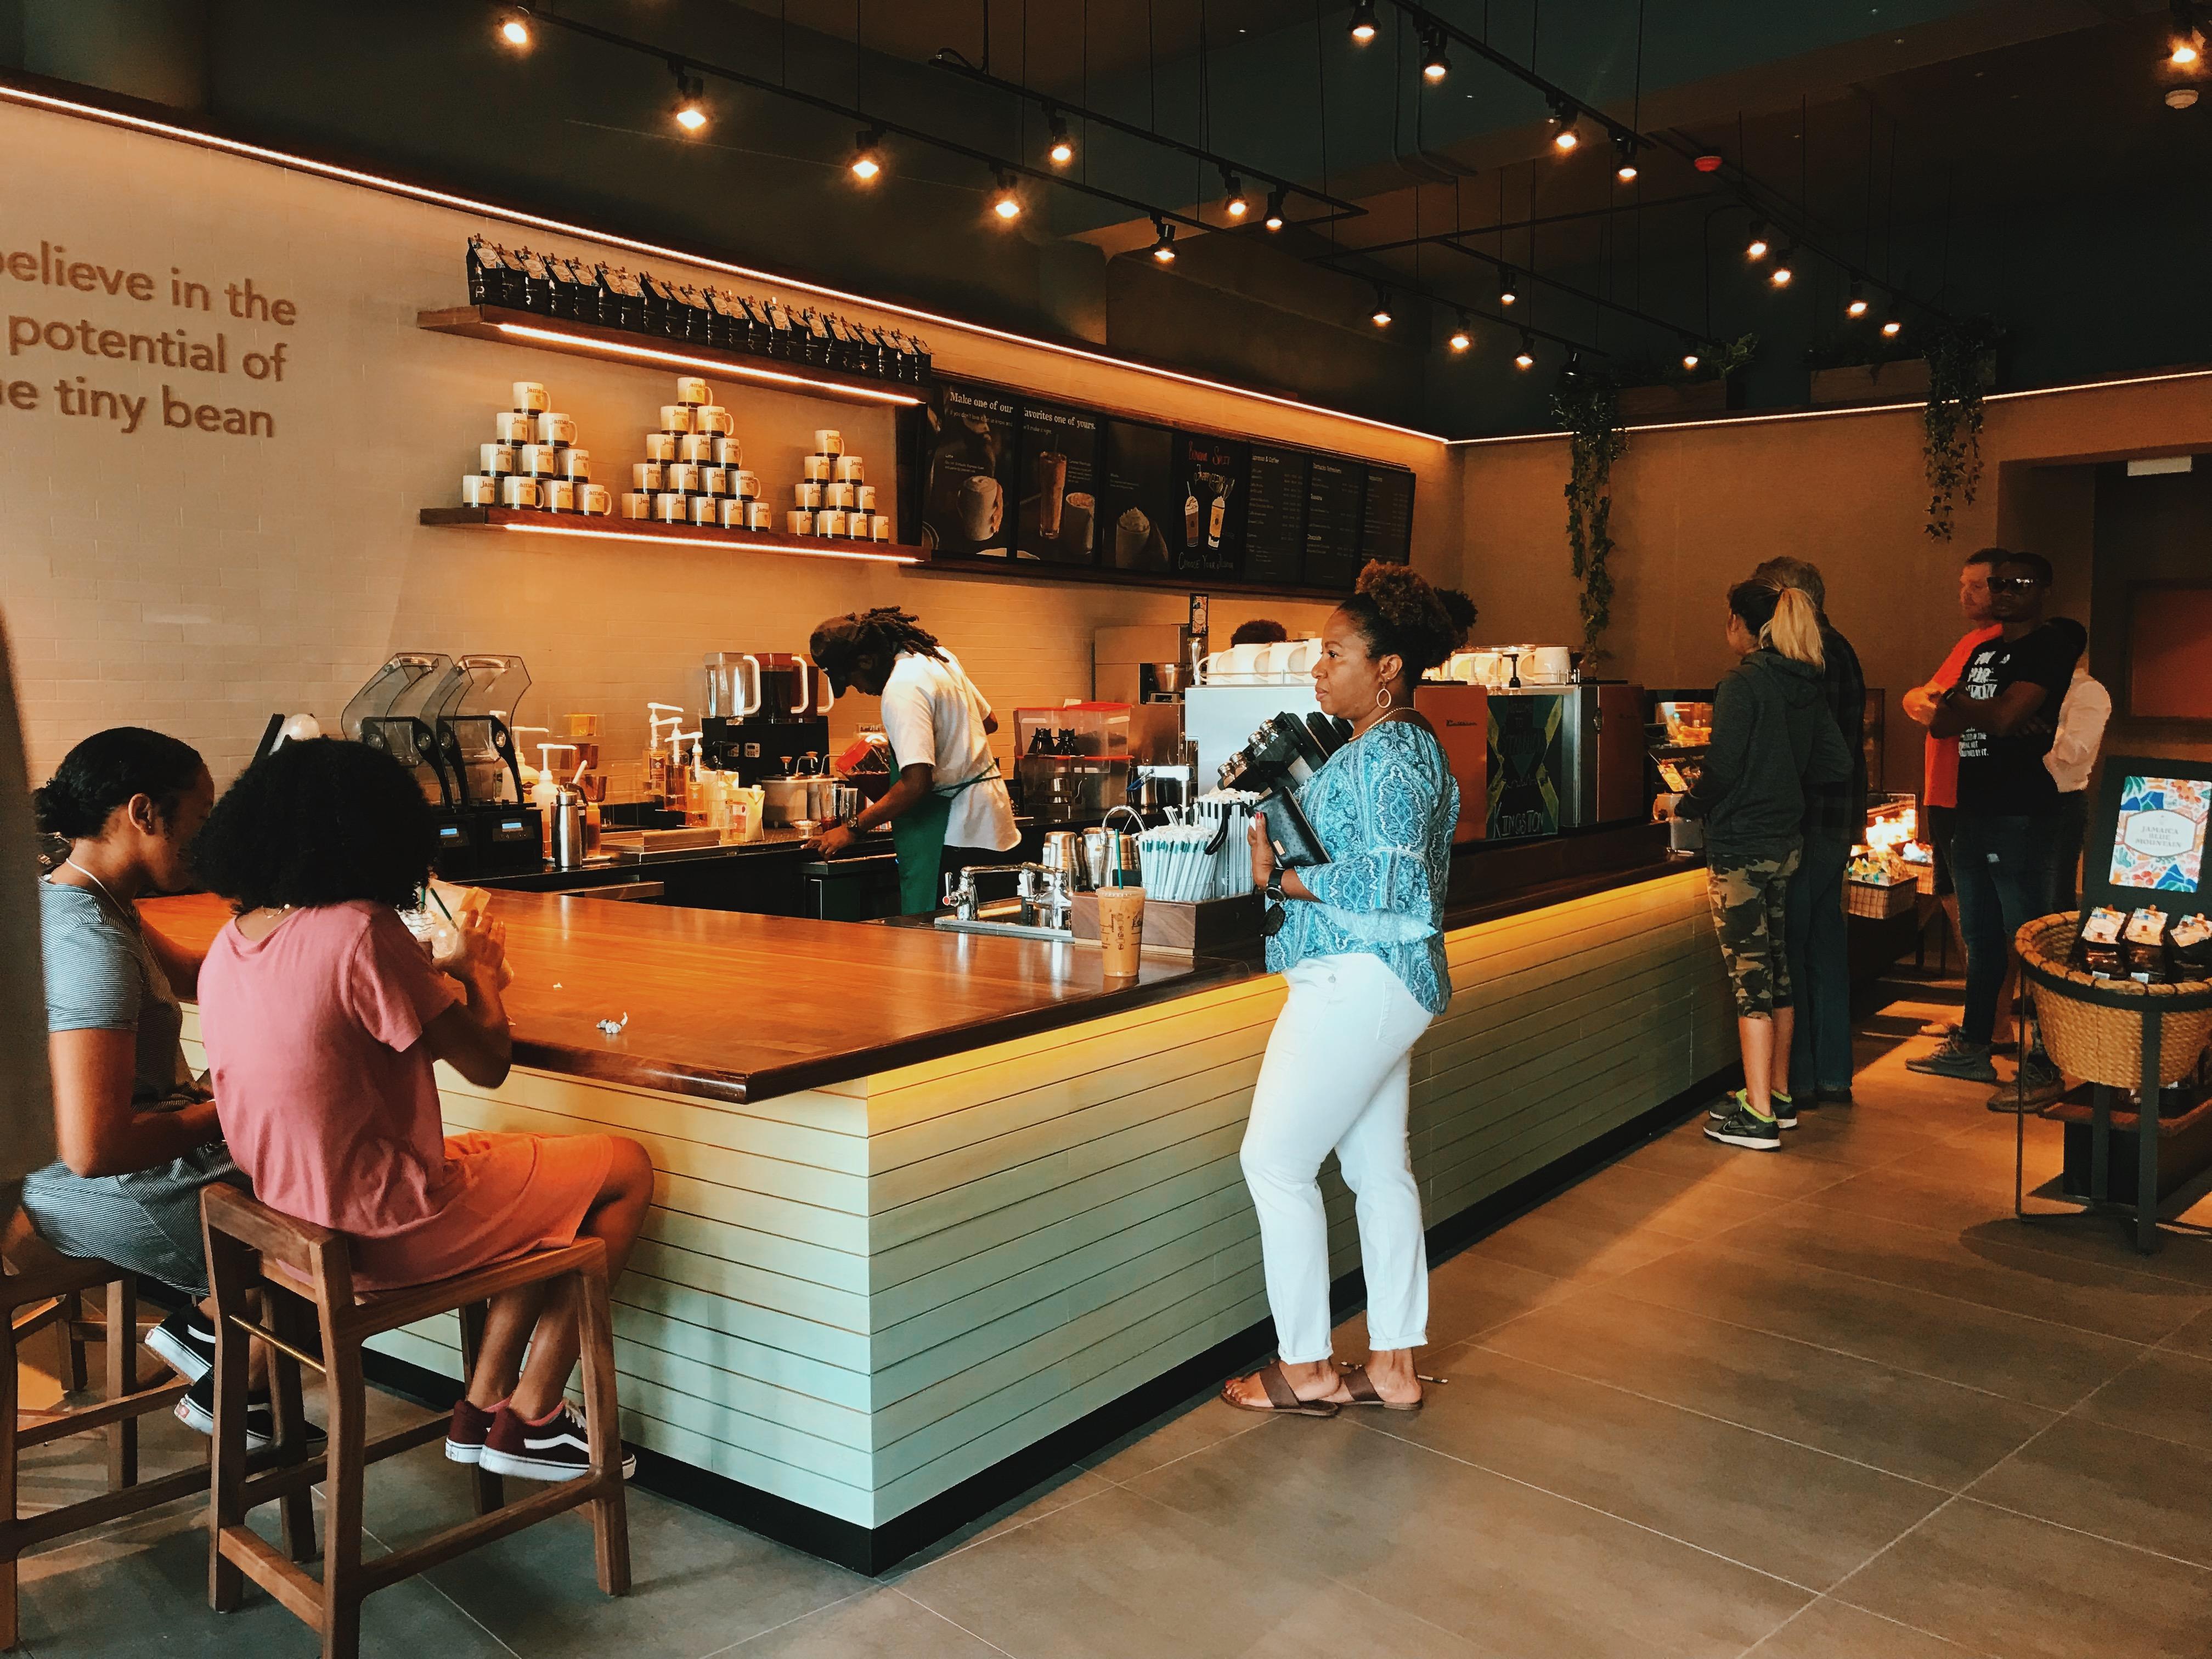 Strange Starbucks Arrives In Kingston Jamaica The Connector Download Free Architecture Designs Scobabritishbridgeorg